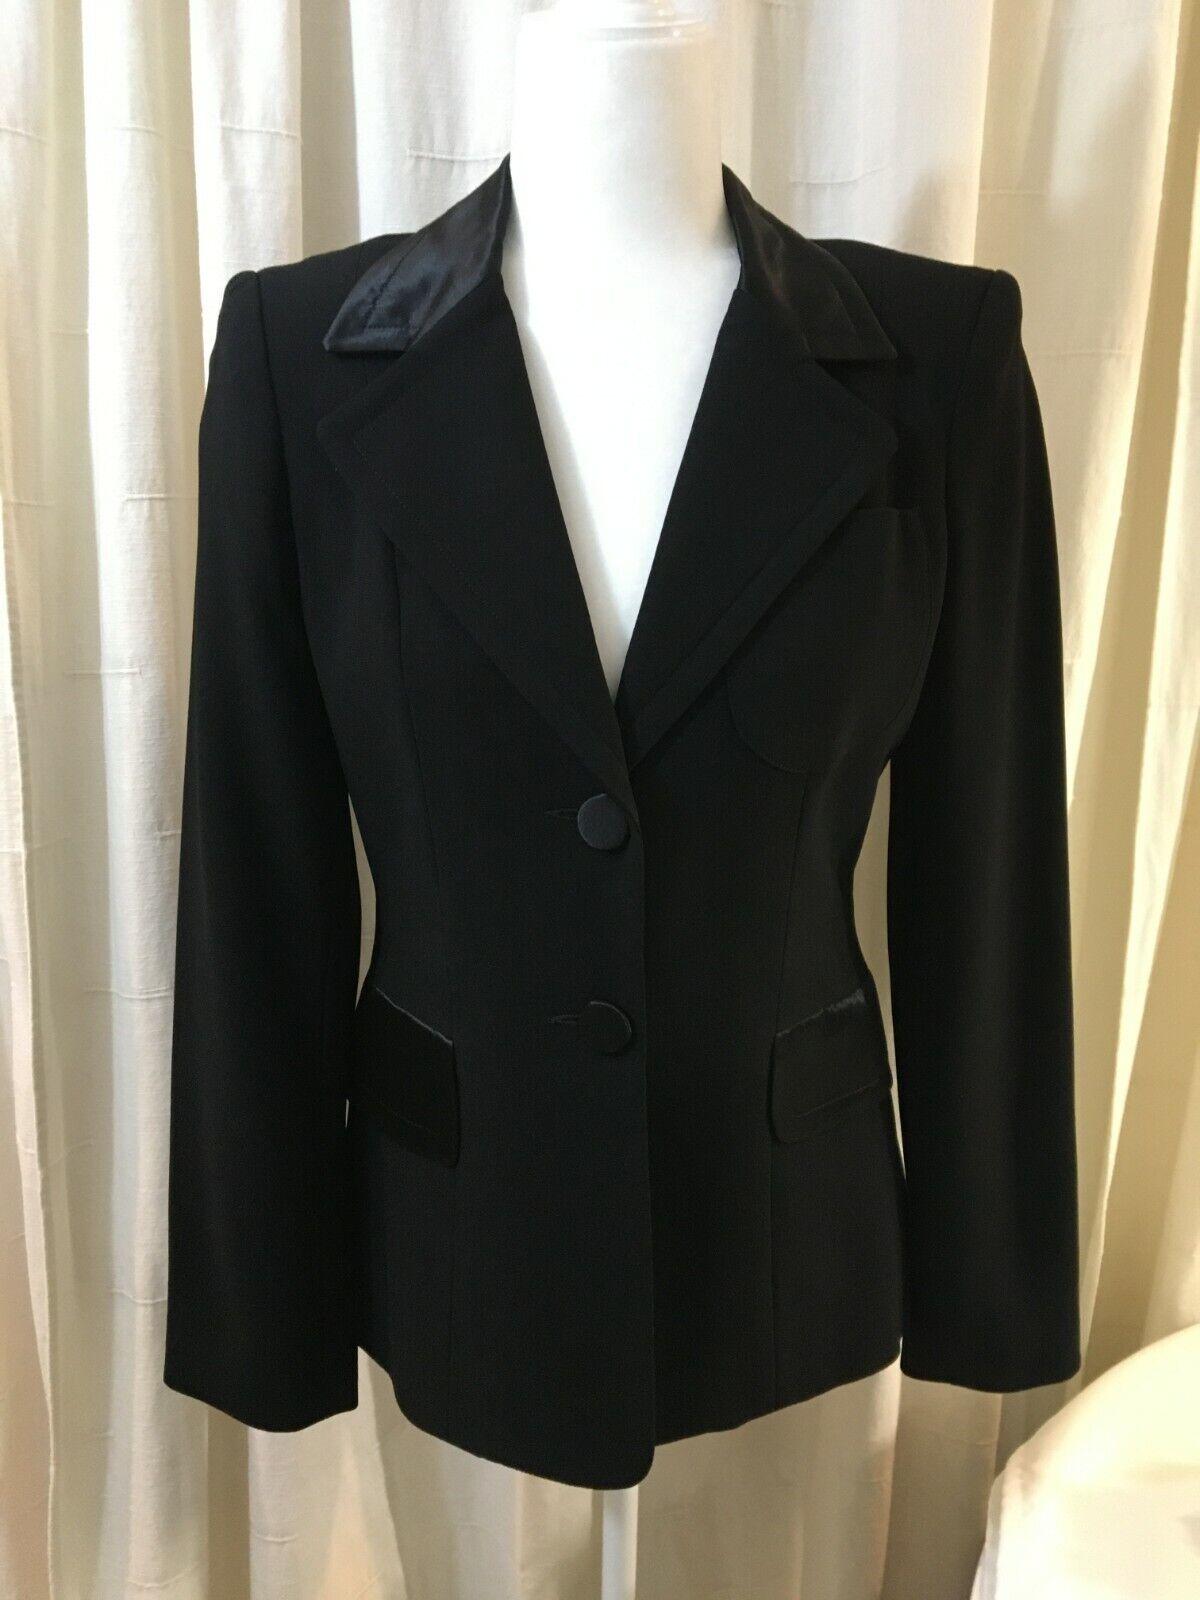 Black Tuxedo Jacket Satin Accents - bebe